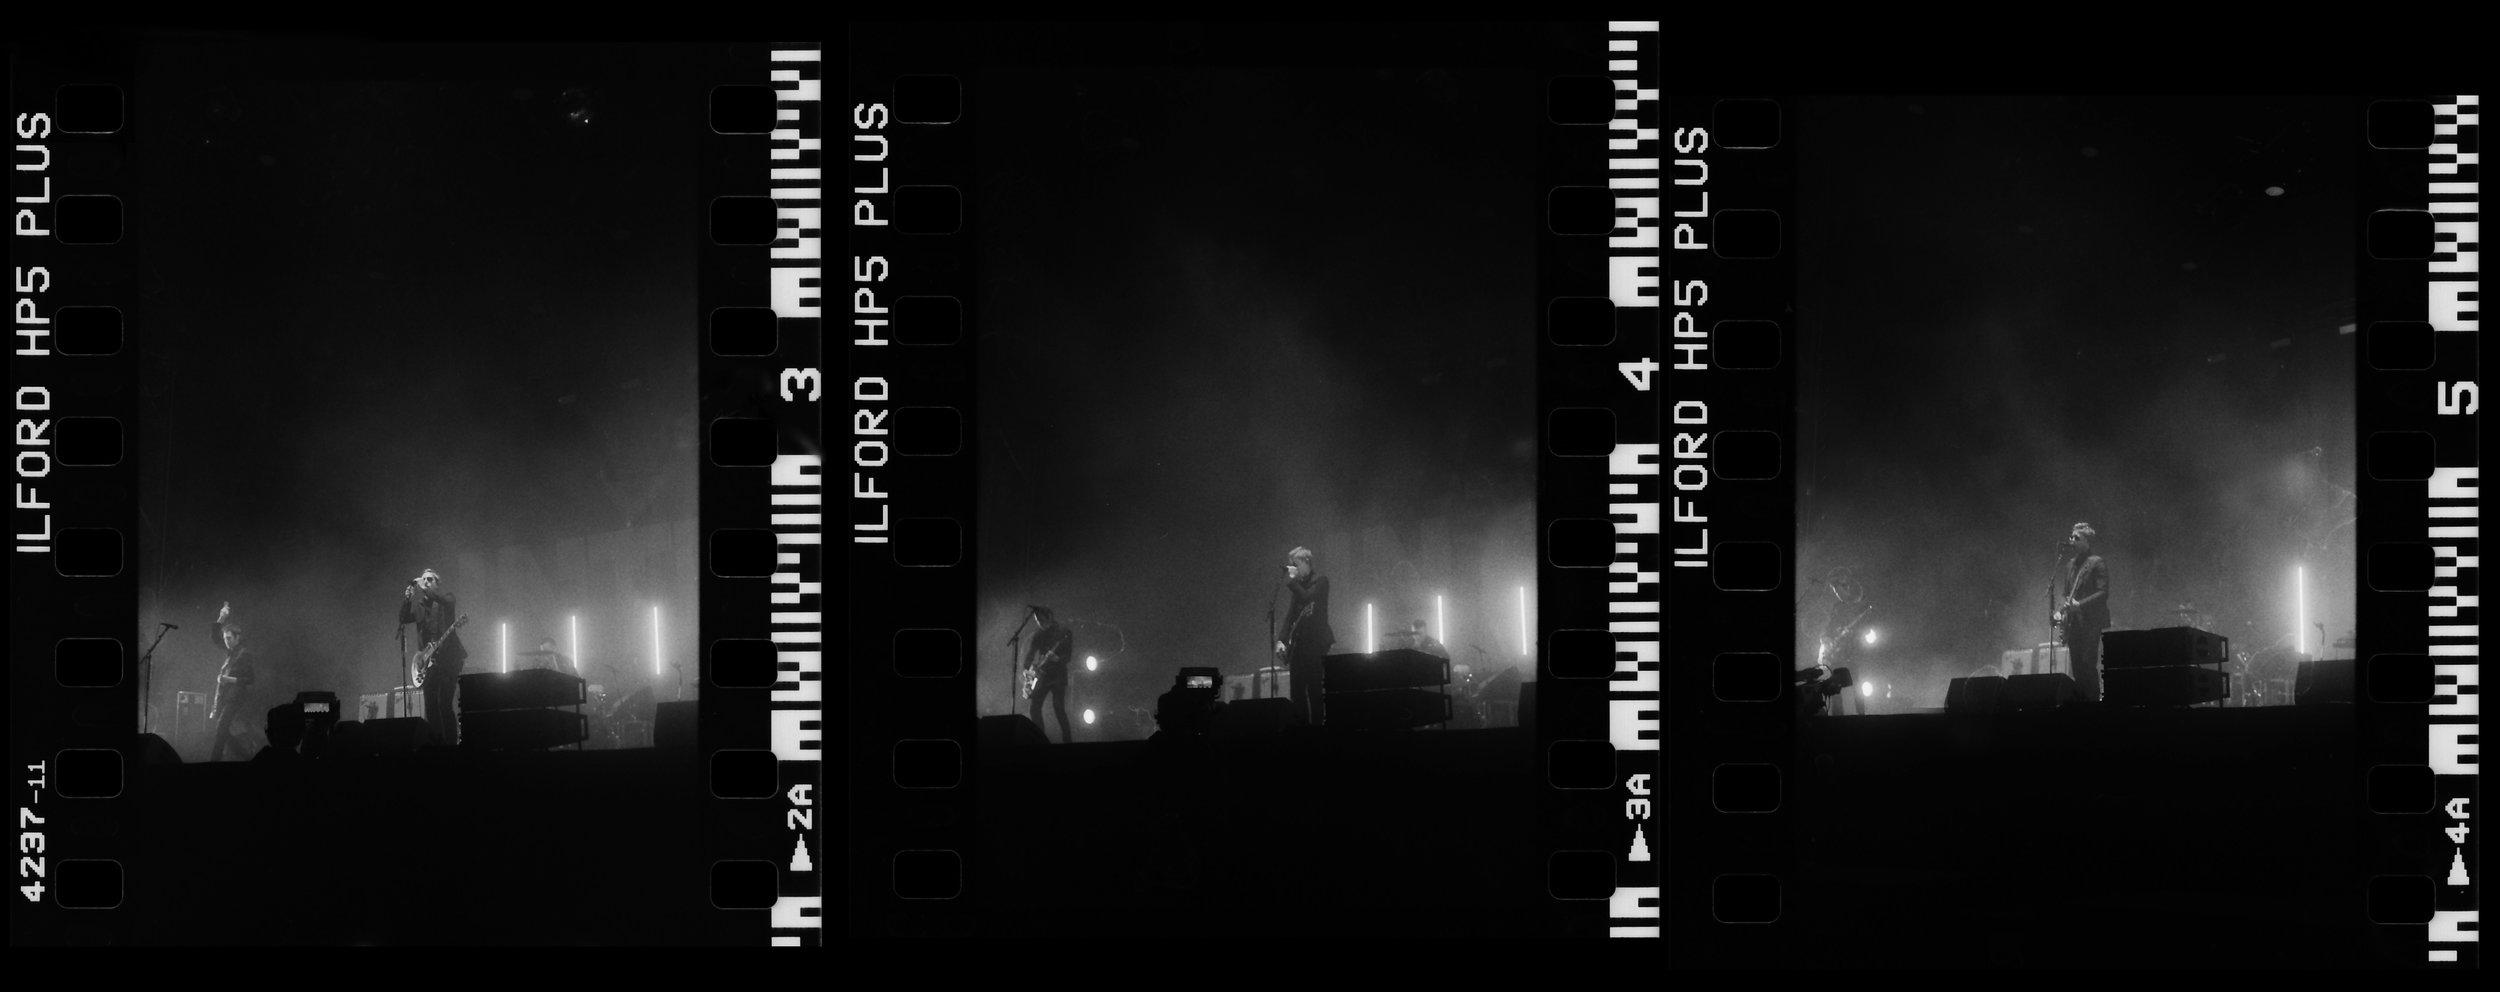 RG Interpol 35mm.jpg